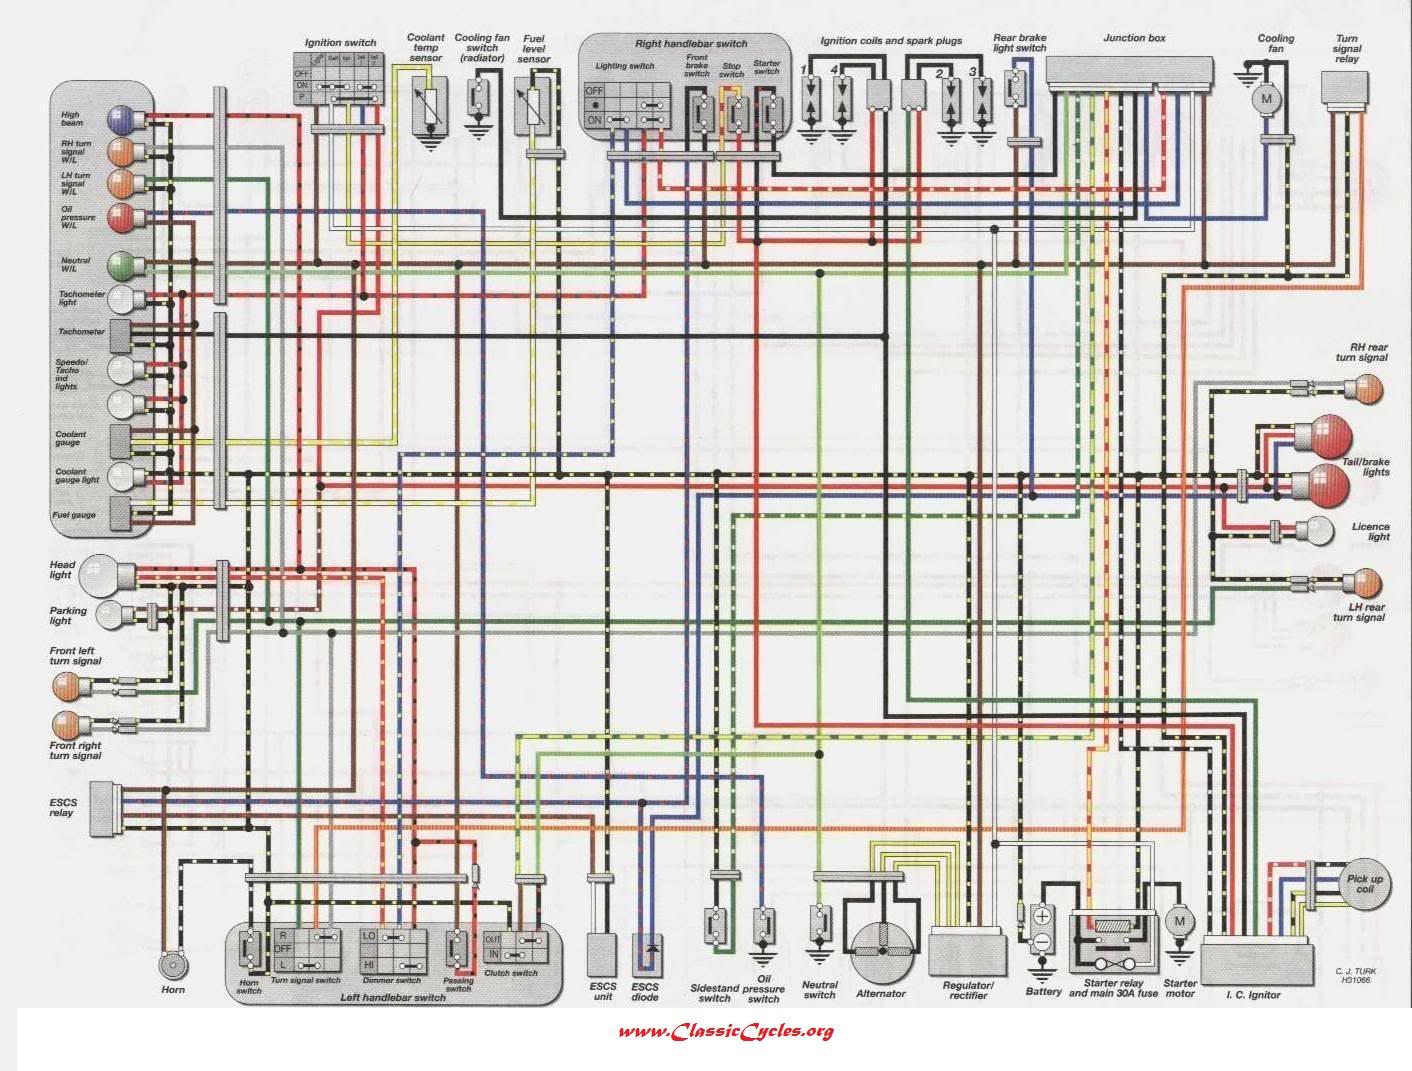 1974 kawasaki h1 500 wiring diagram